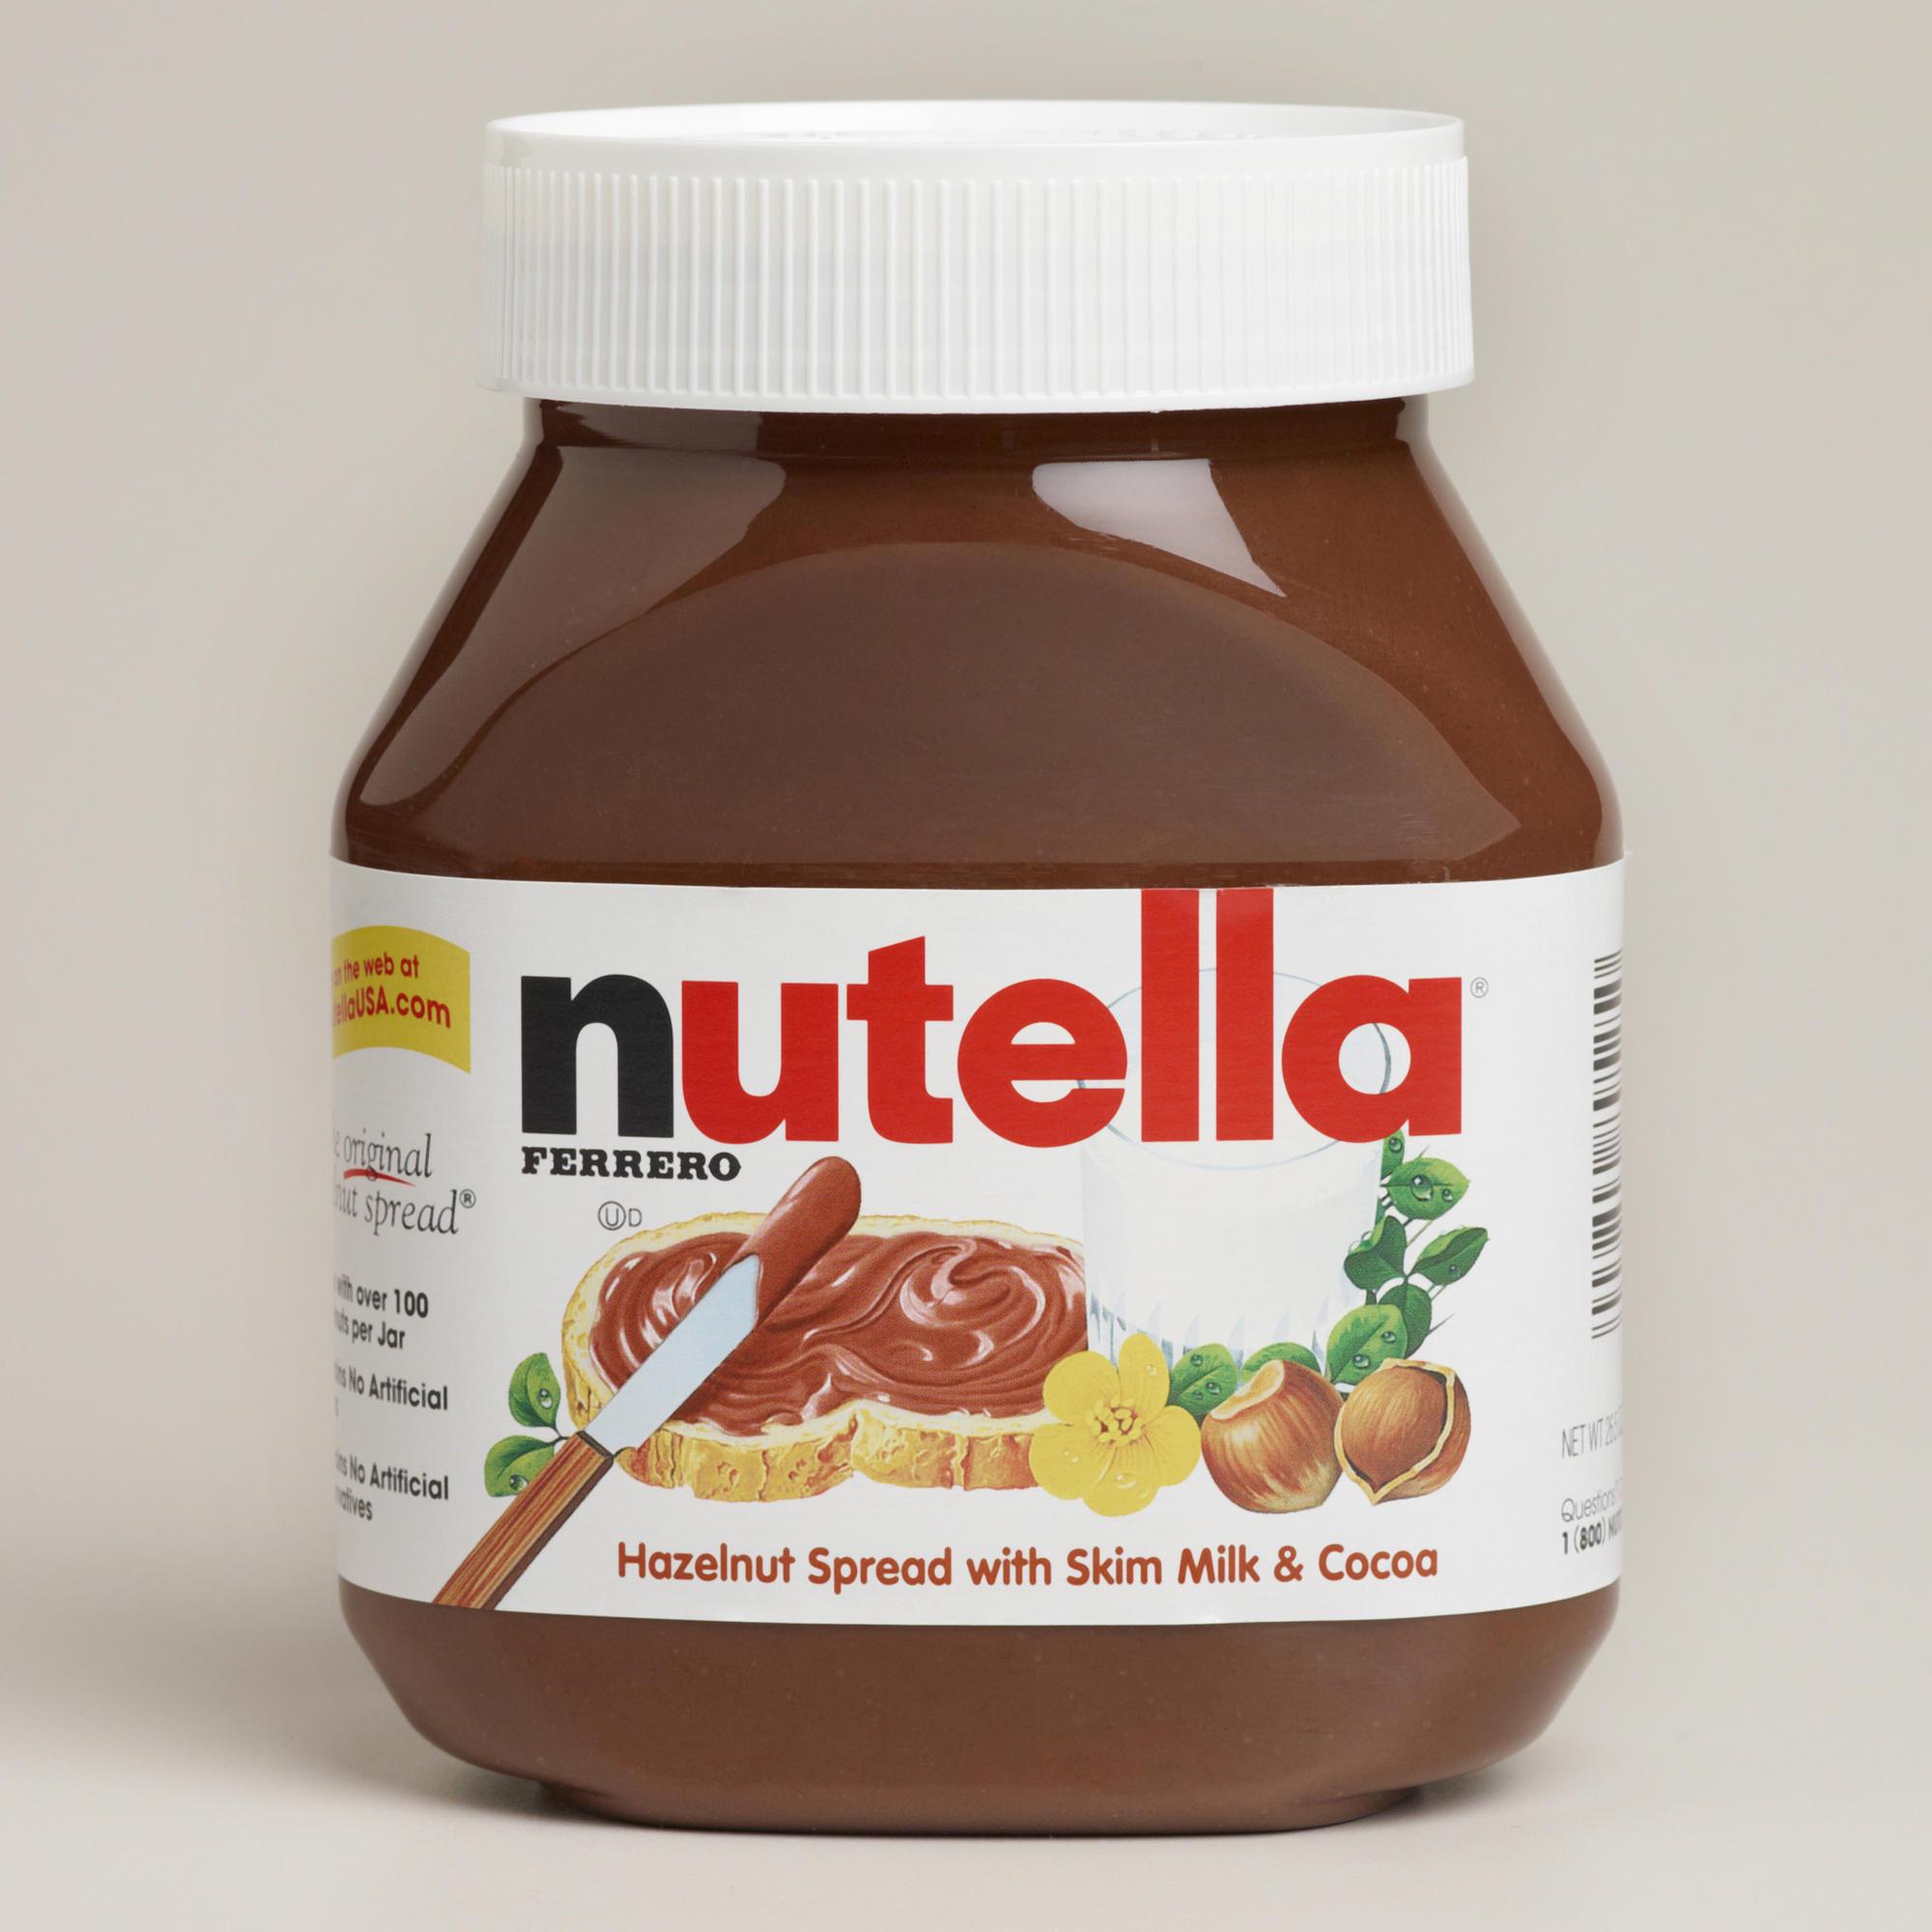 Интересные факты о Nutella